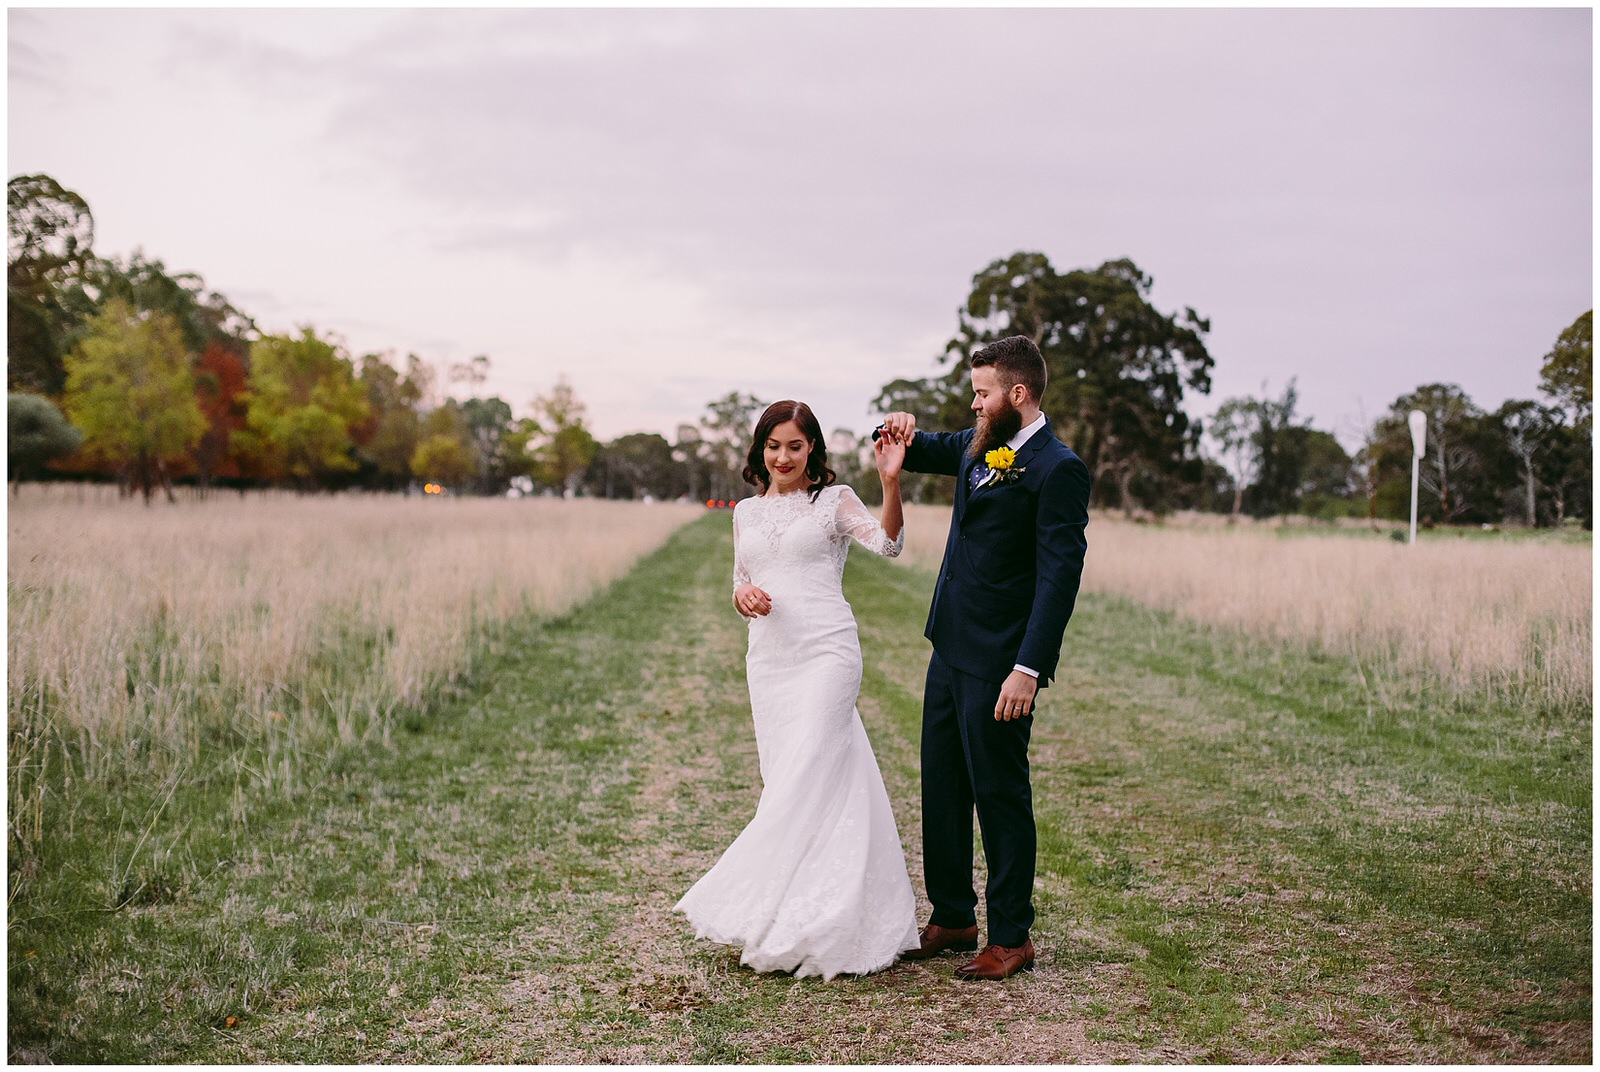 Al Ru Farm Wedding Photographer Adelaide Autumn Photography